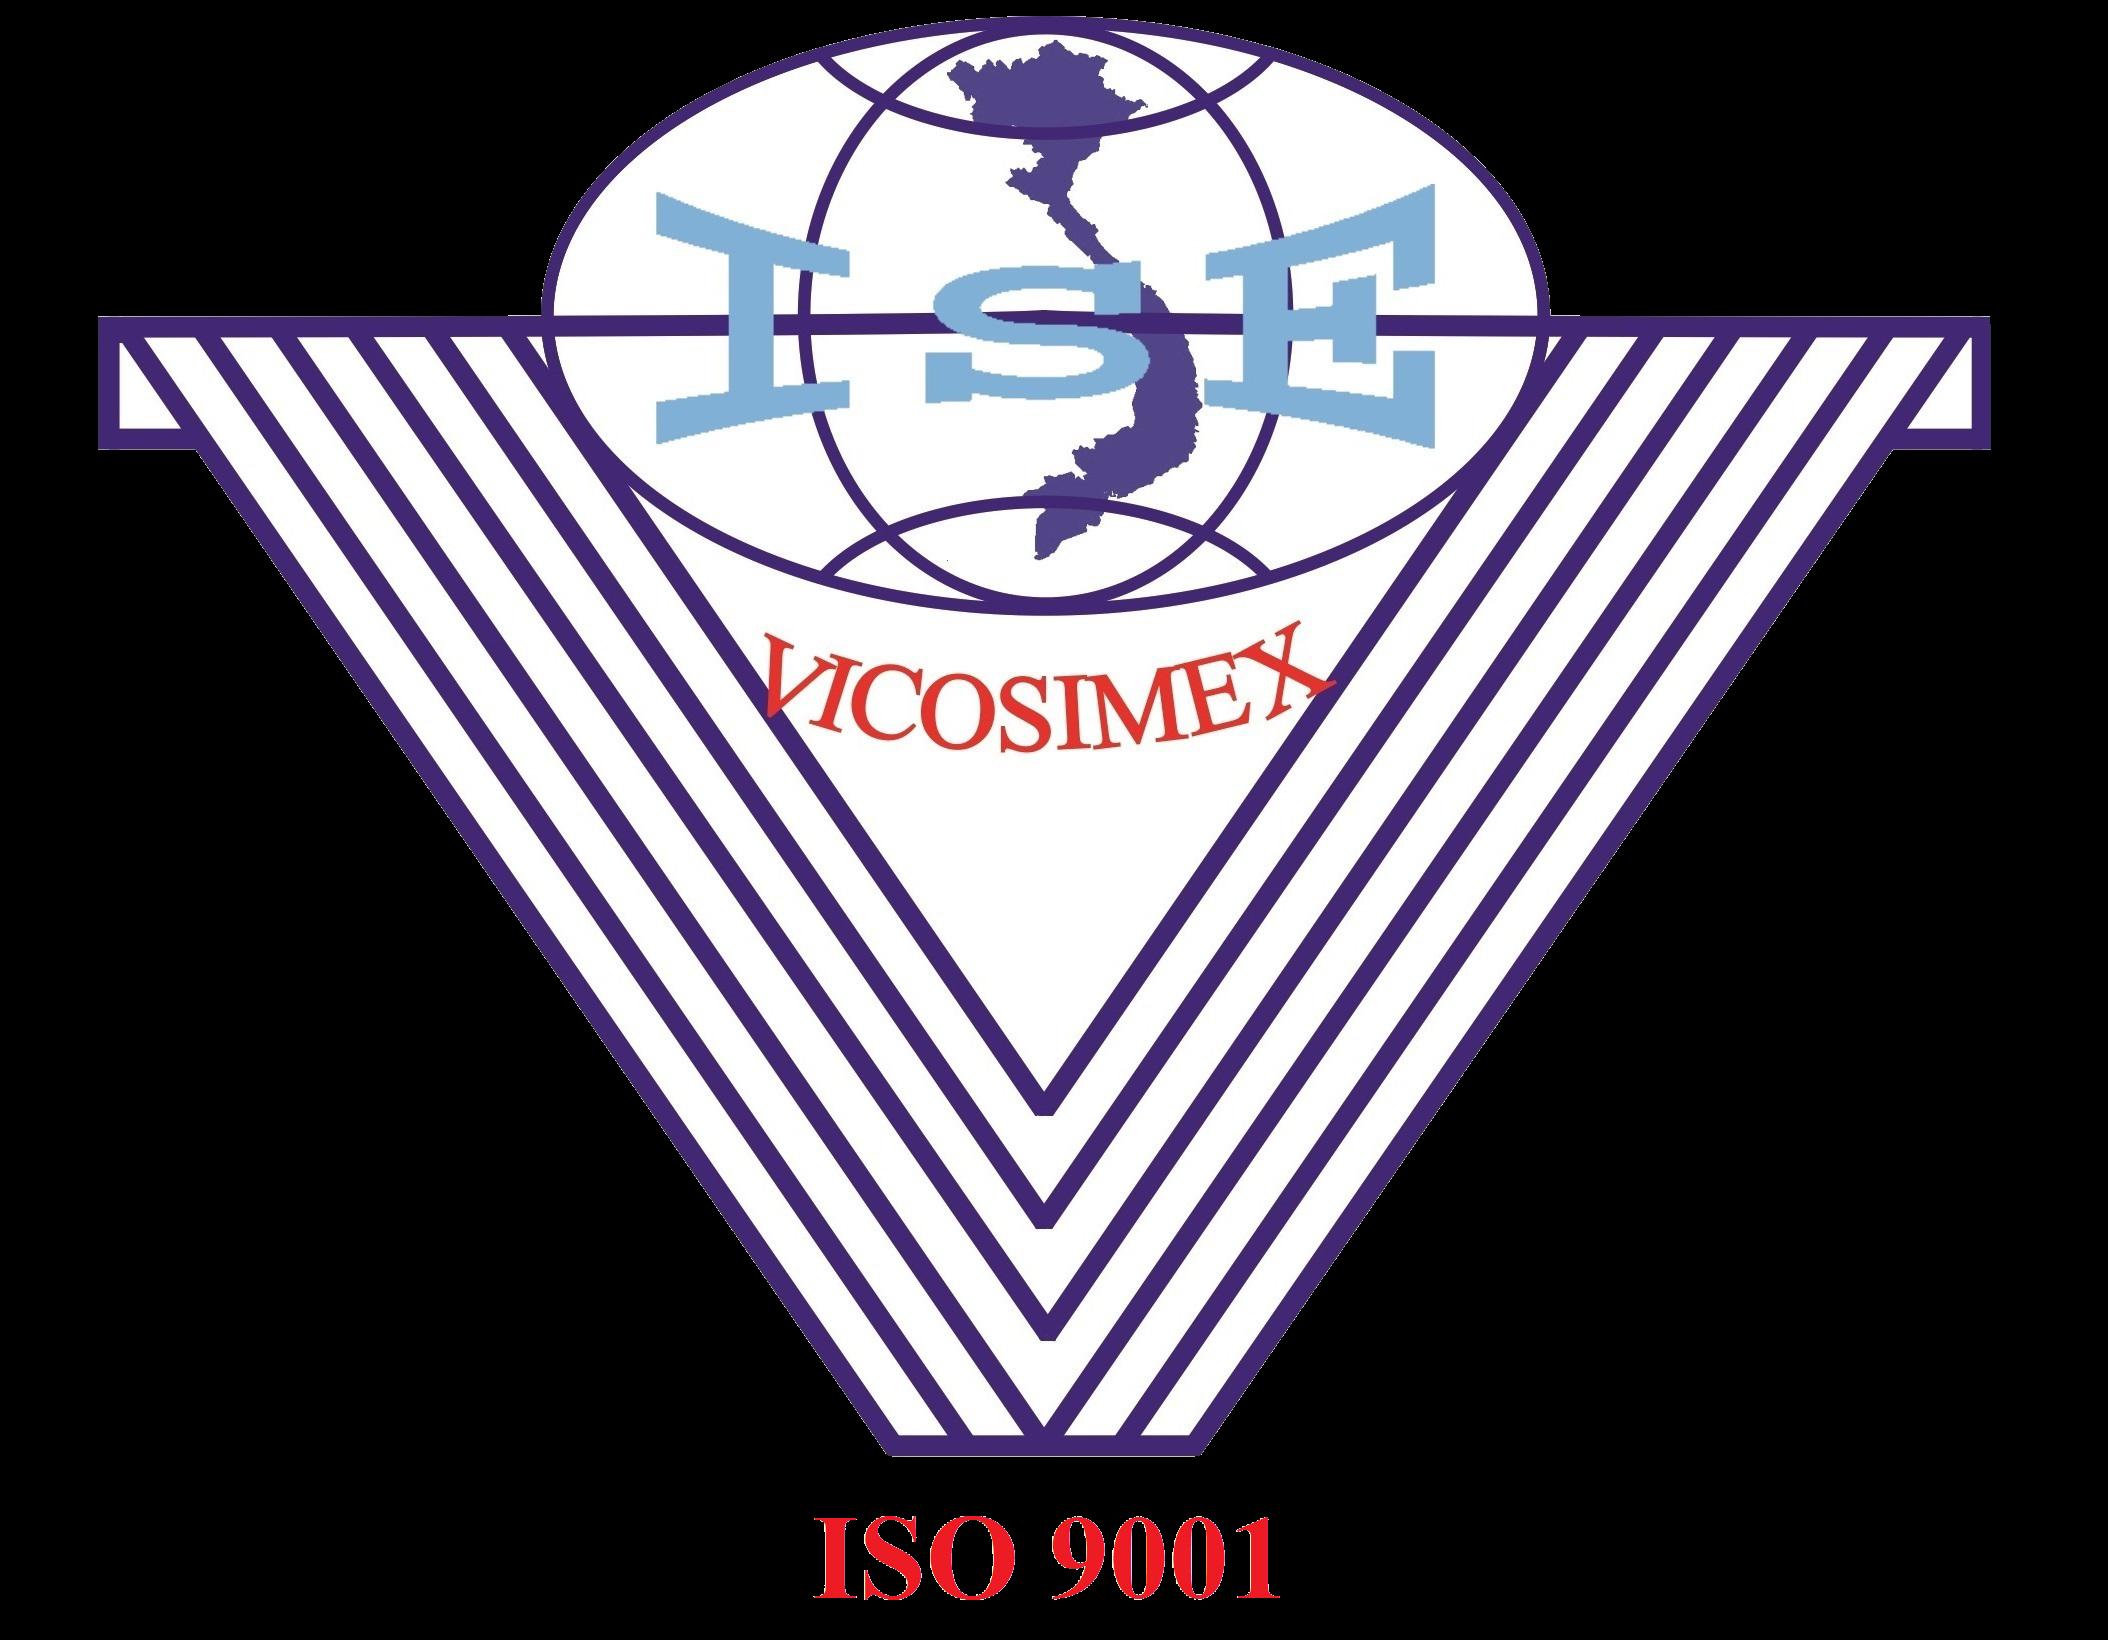 Vicosimex